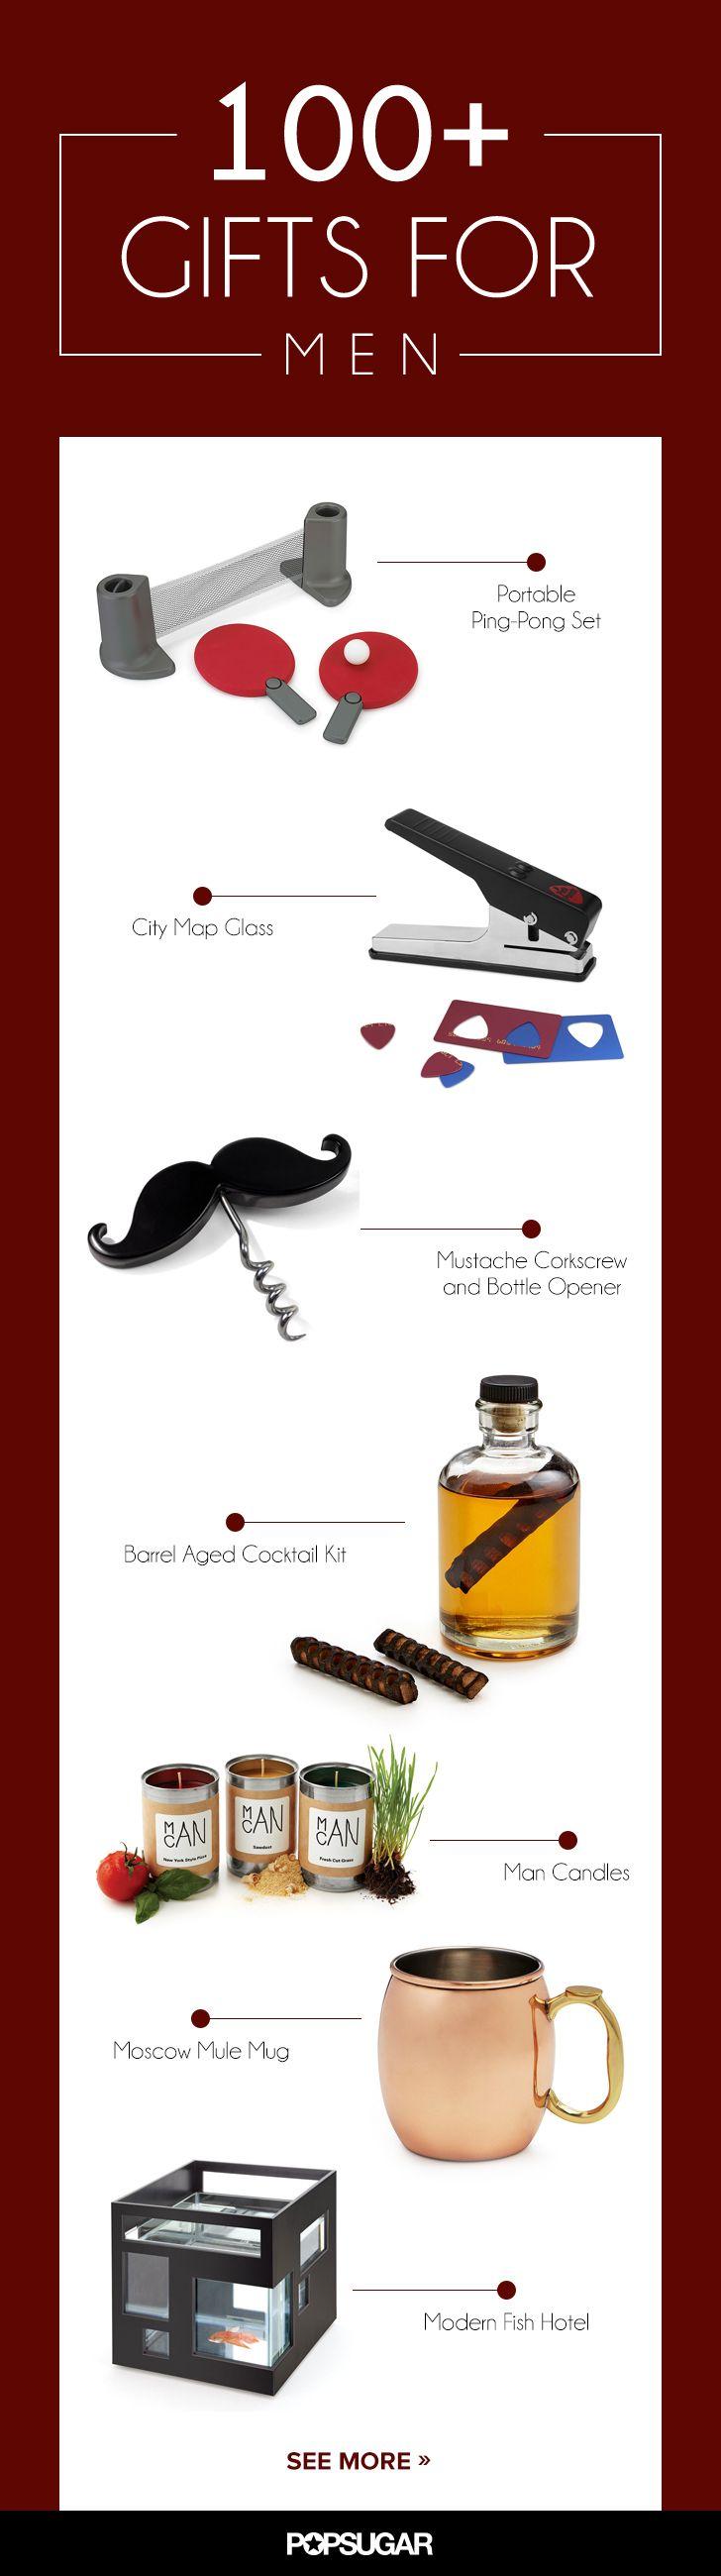 best things for men images on pinterest good ideas birthdays